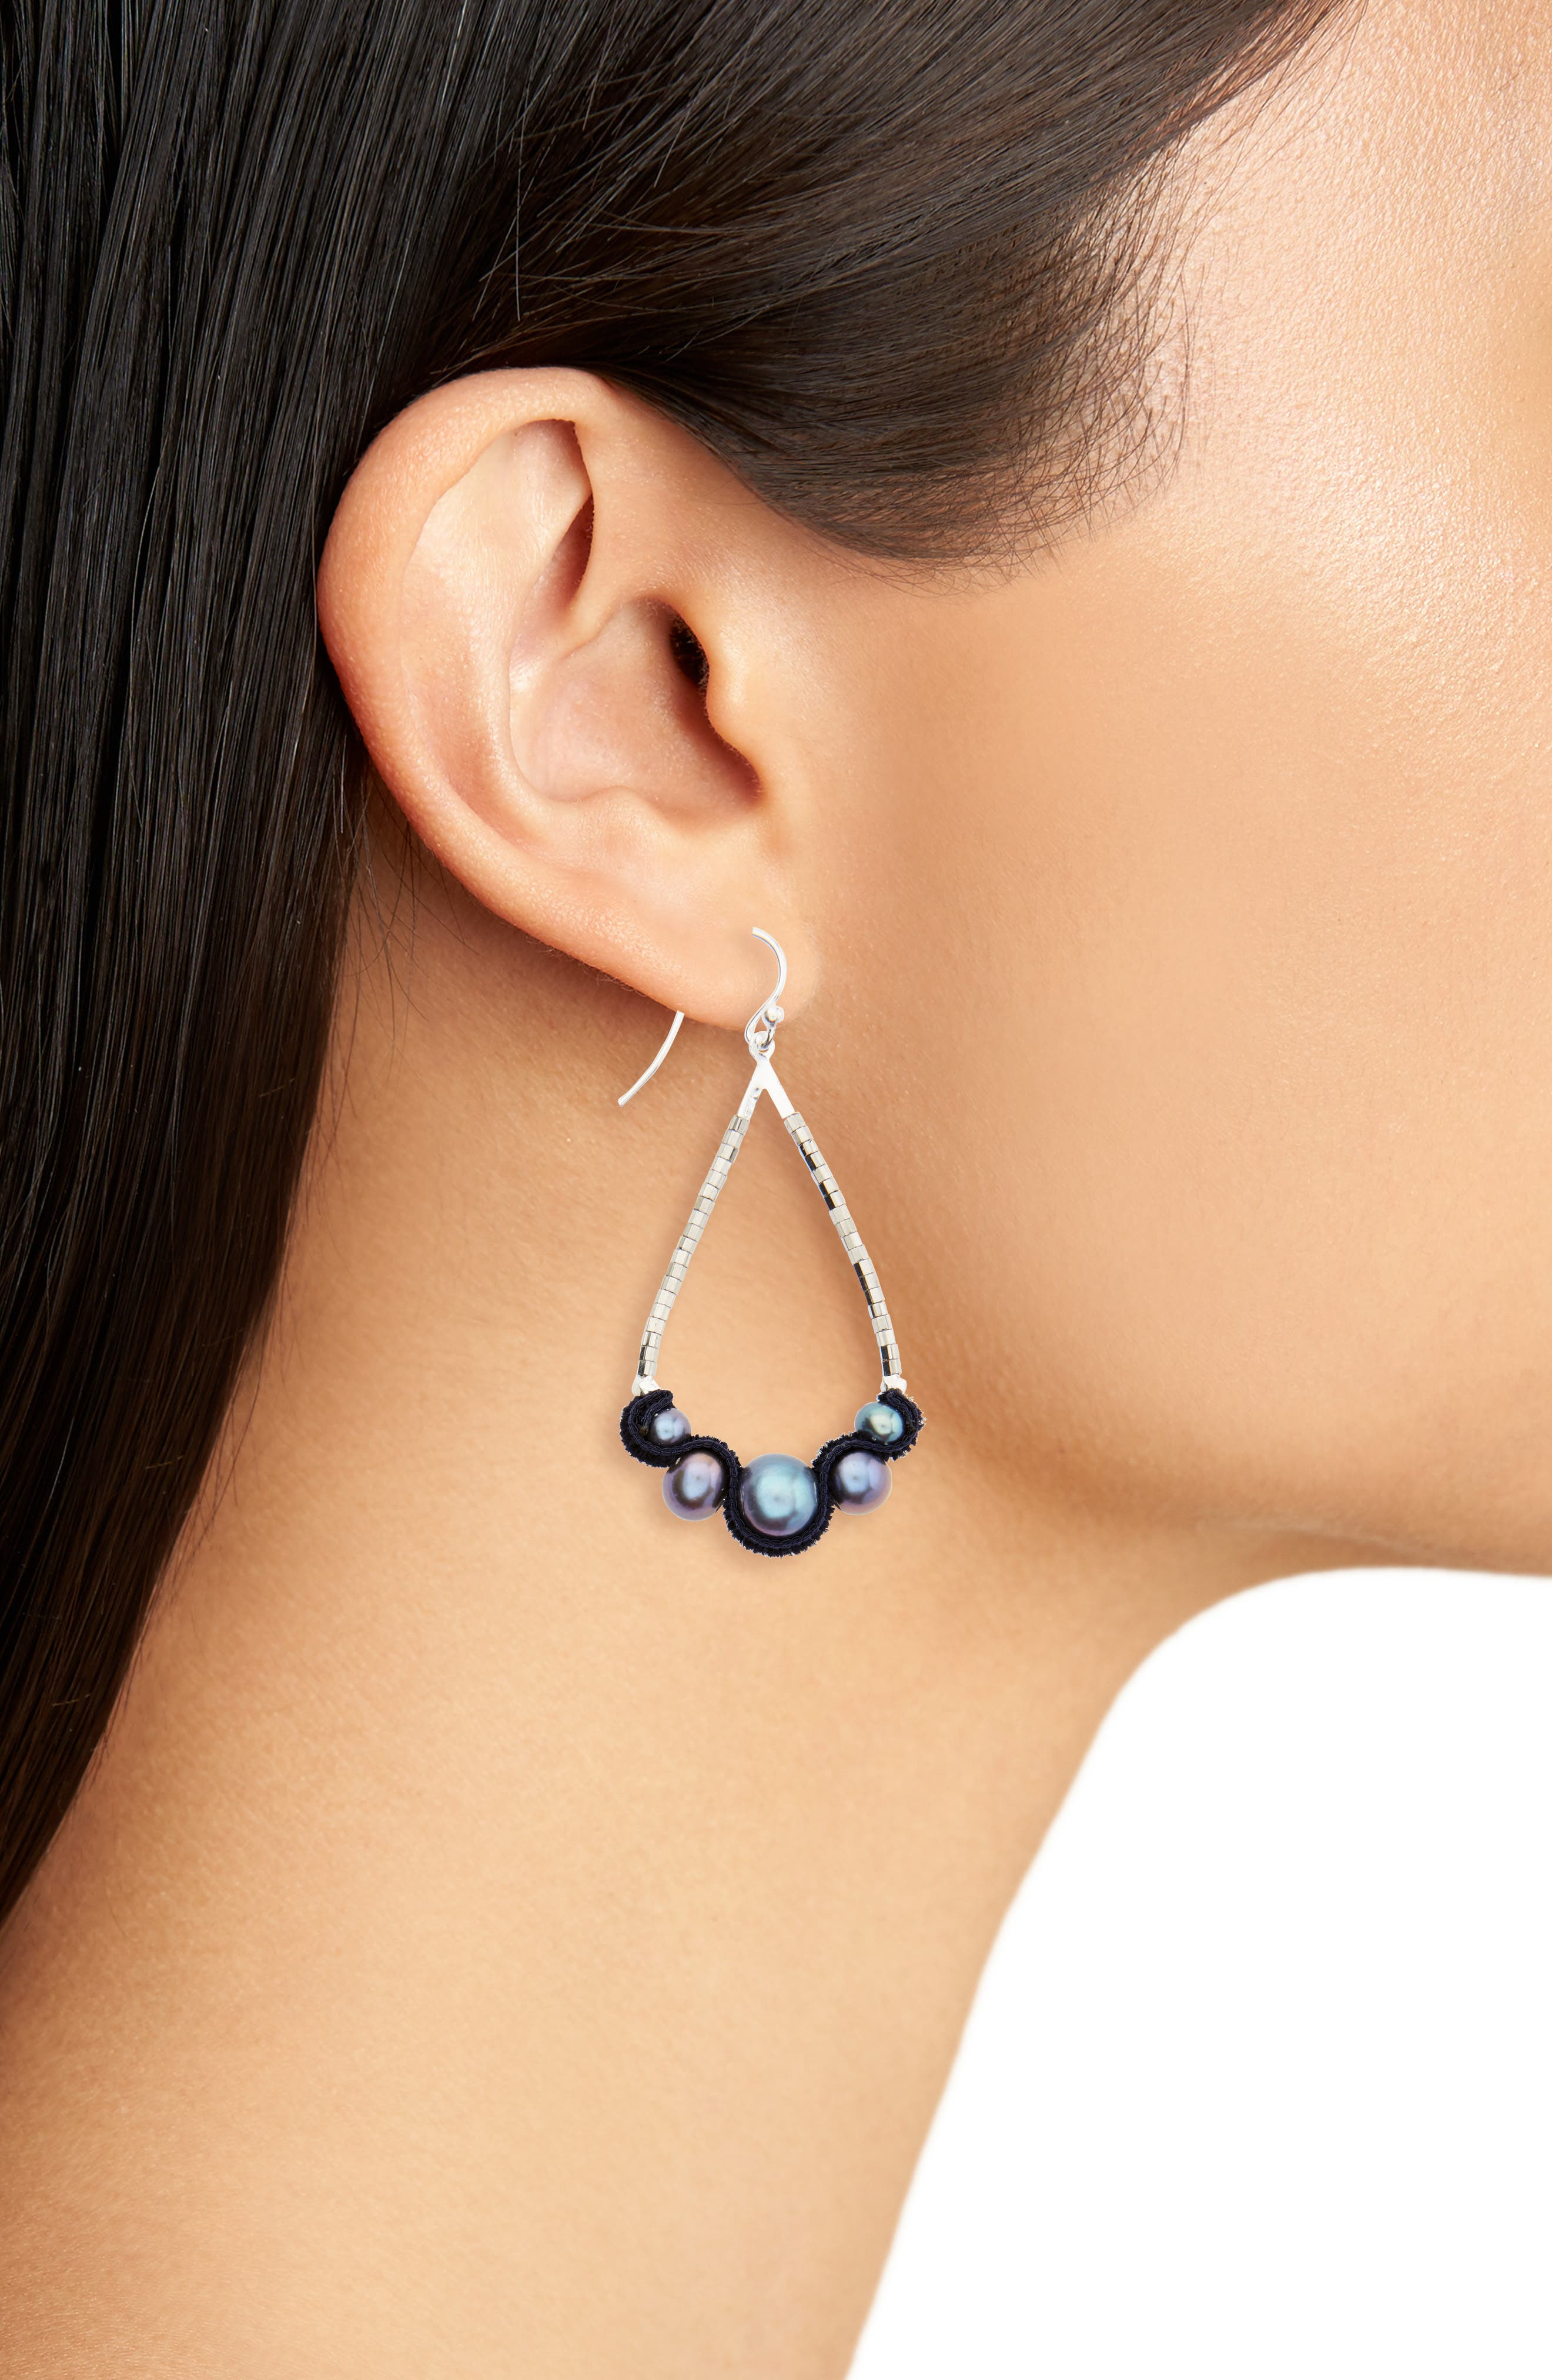 Velvet & Pearl Drop Earrings,                             Alternate thumbnail 2, color,                             Peacock Blue Pearl